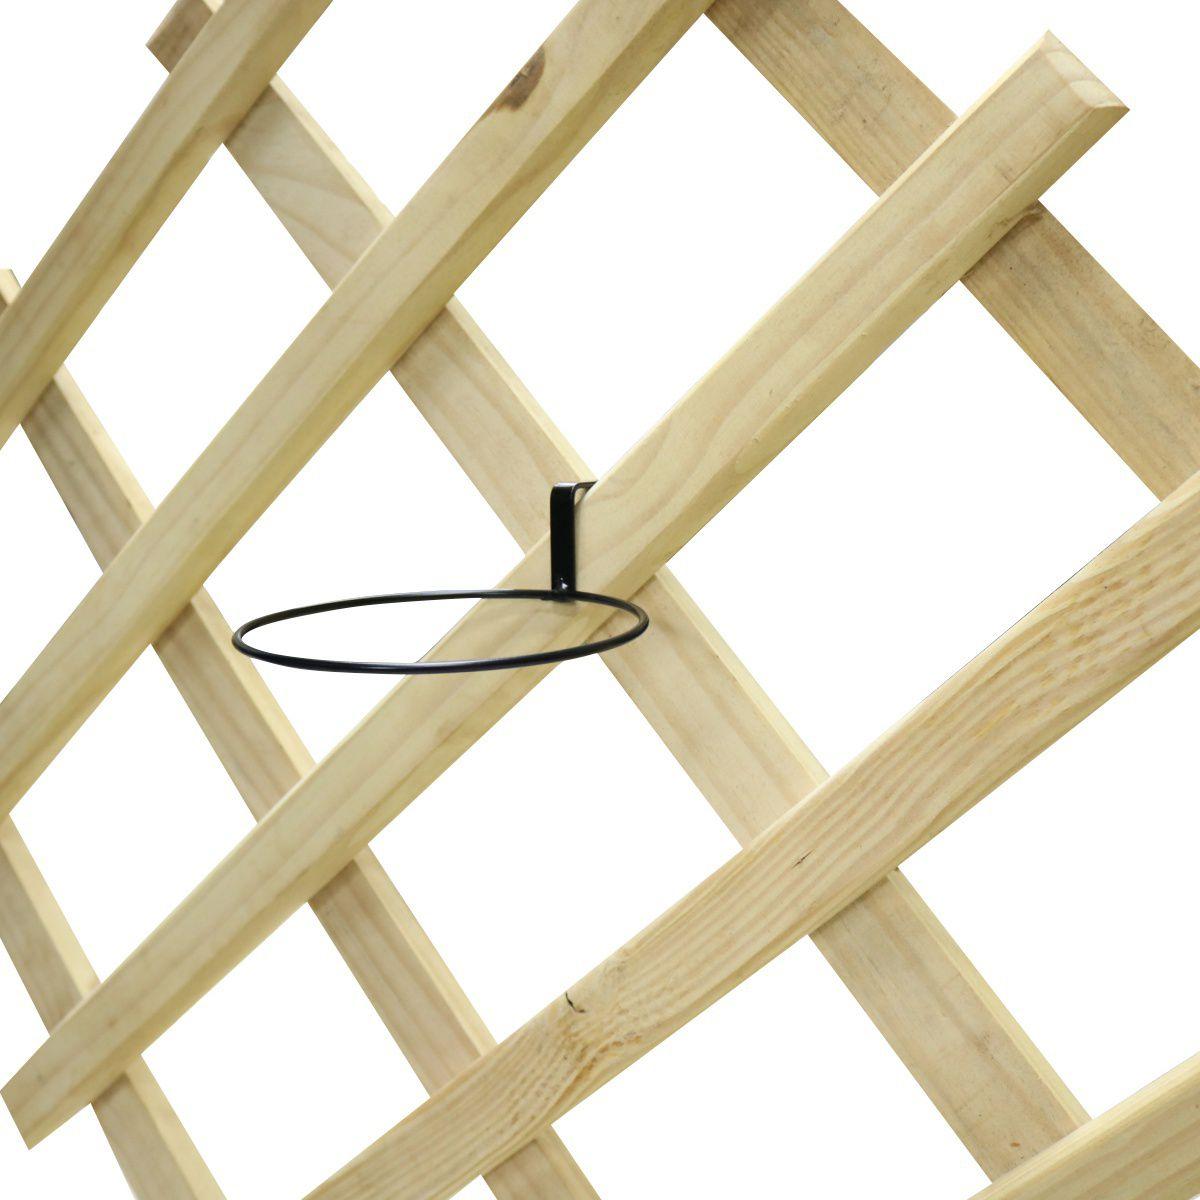 Suporte de Treliça Diagonal Preto para Vaso Autoirrigável Médio Raiz